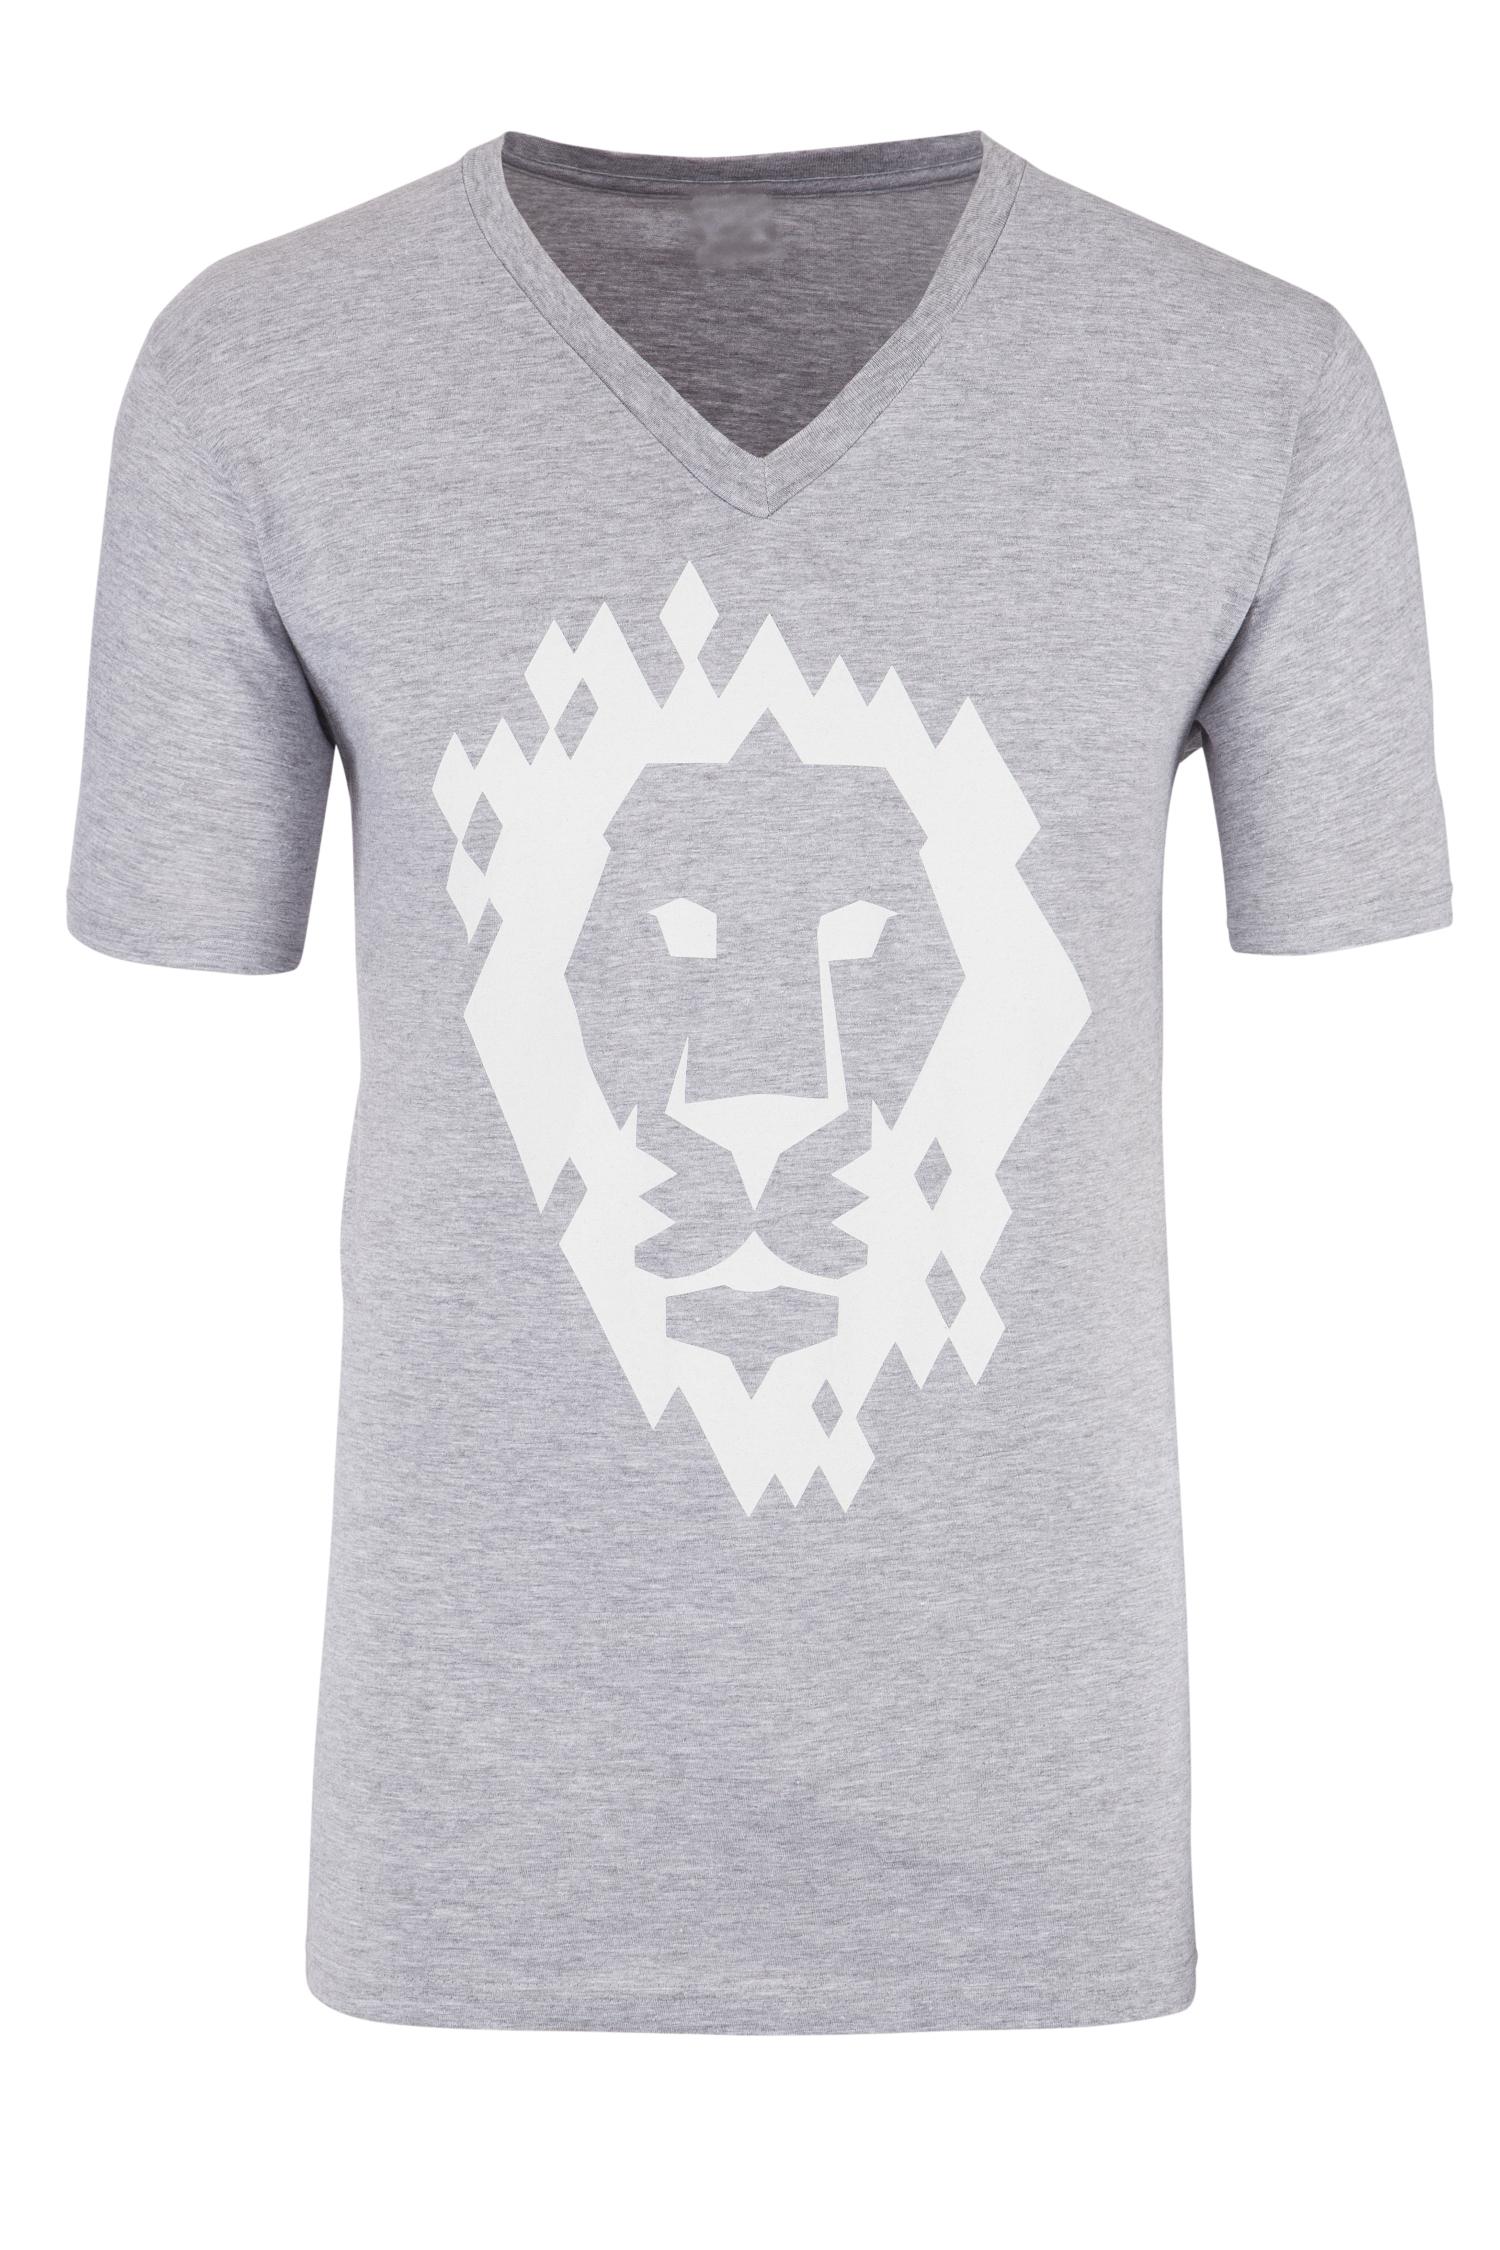 Herren T-Shirt XL | grau